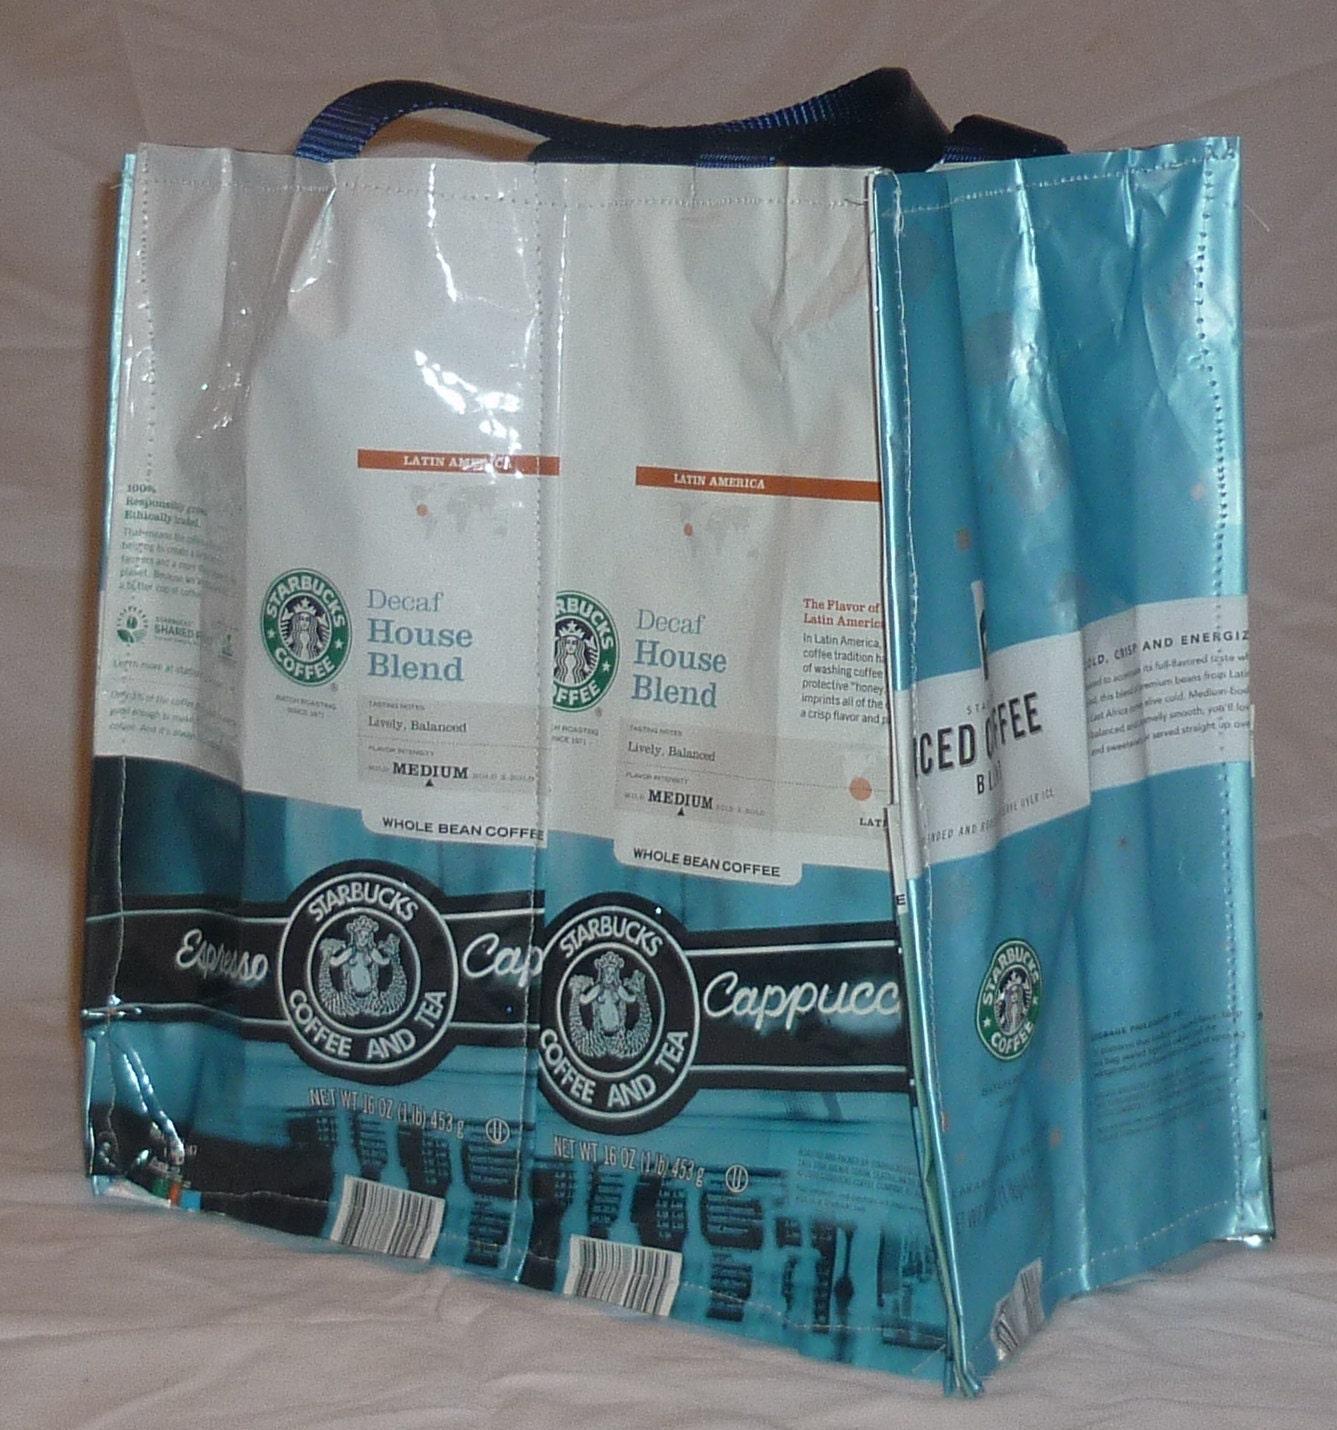 Recycled Tote Bag Starbucks Coffee Bean Bag - Decaf House, Iced Coffee ...